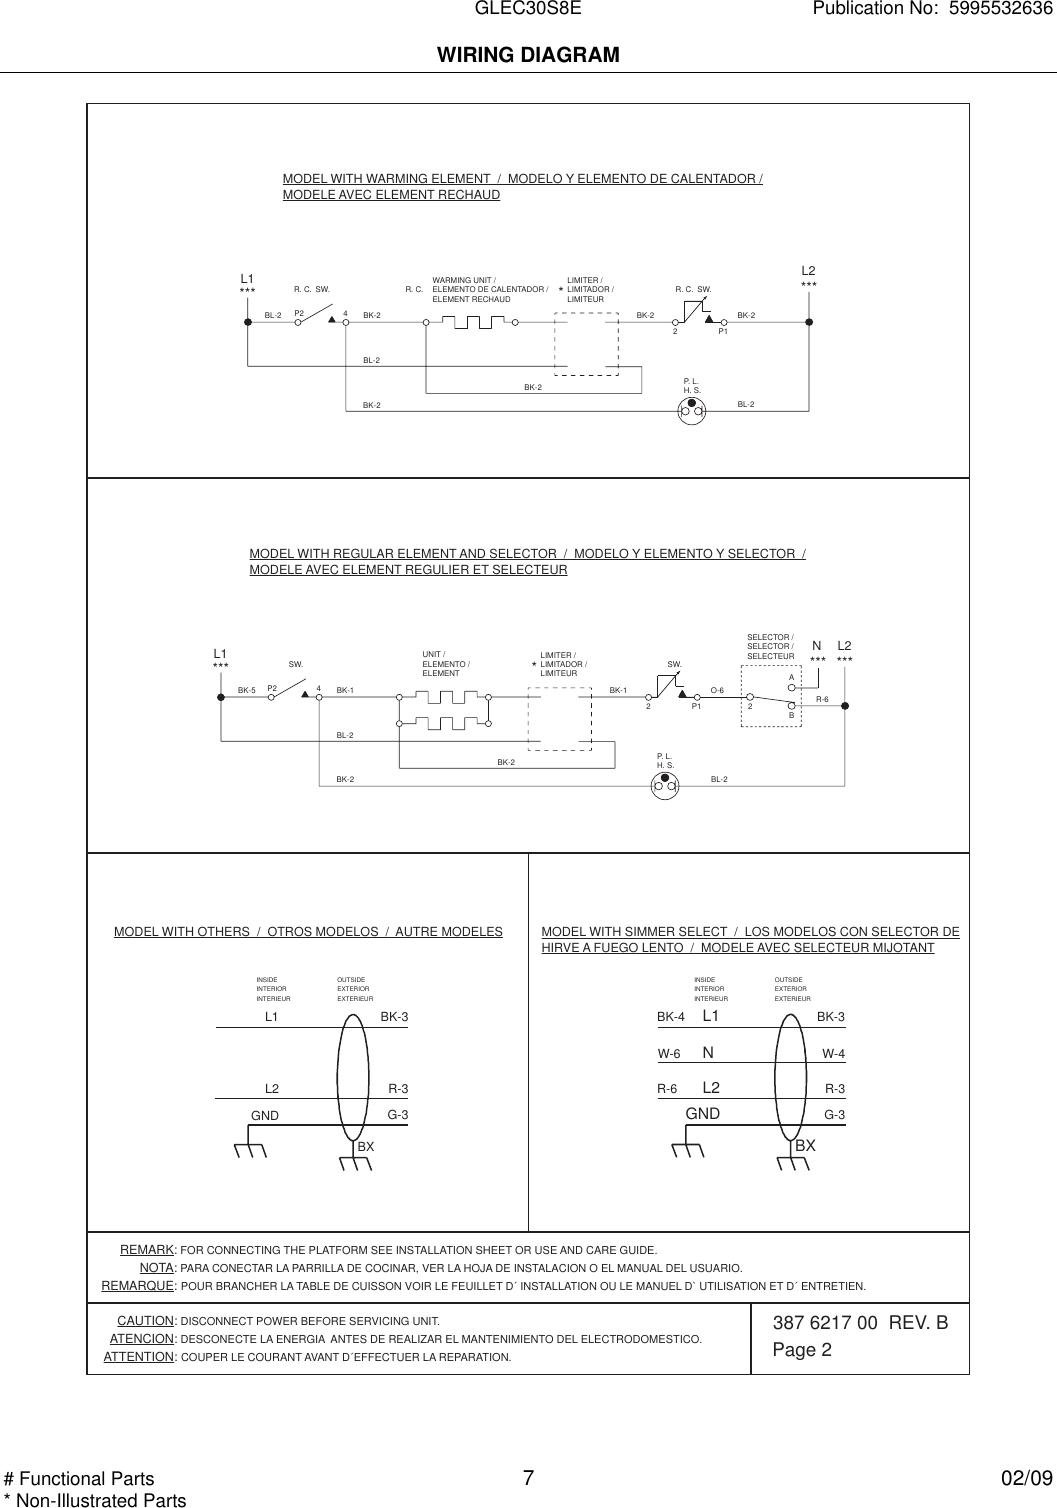 Frigidaire Ffec3024lb Wiring Diagram 5995532636 Page 2 Of